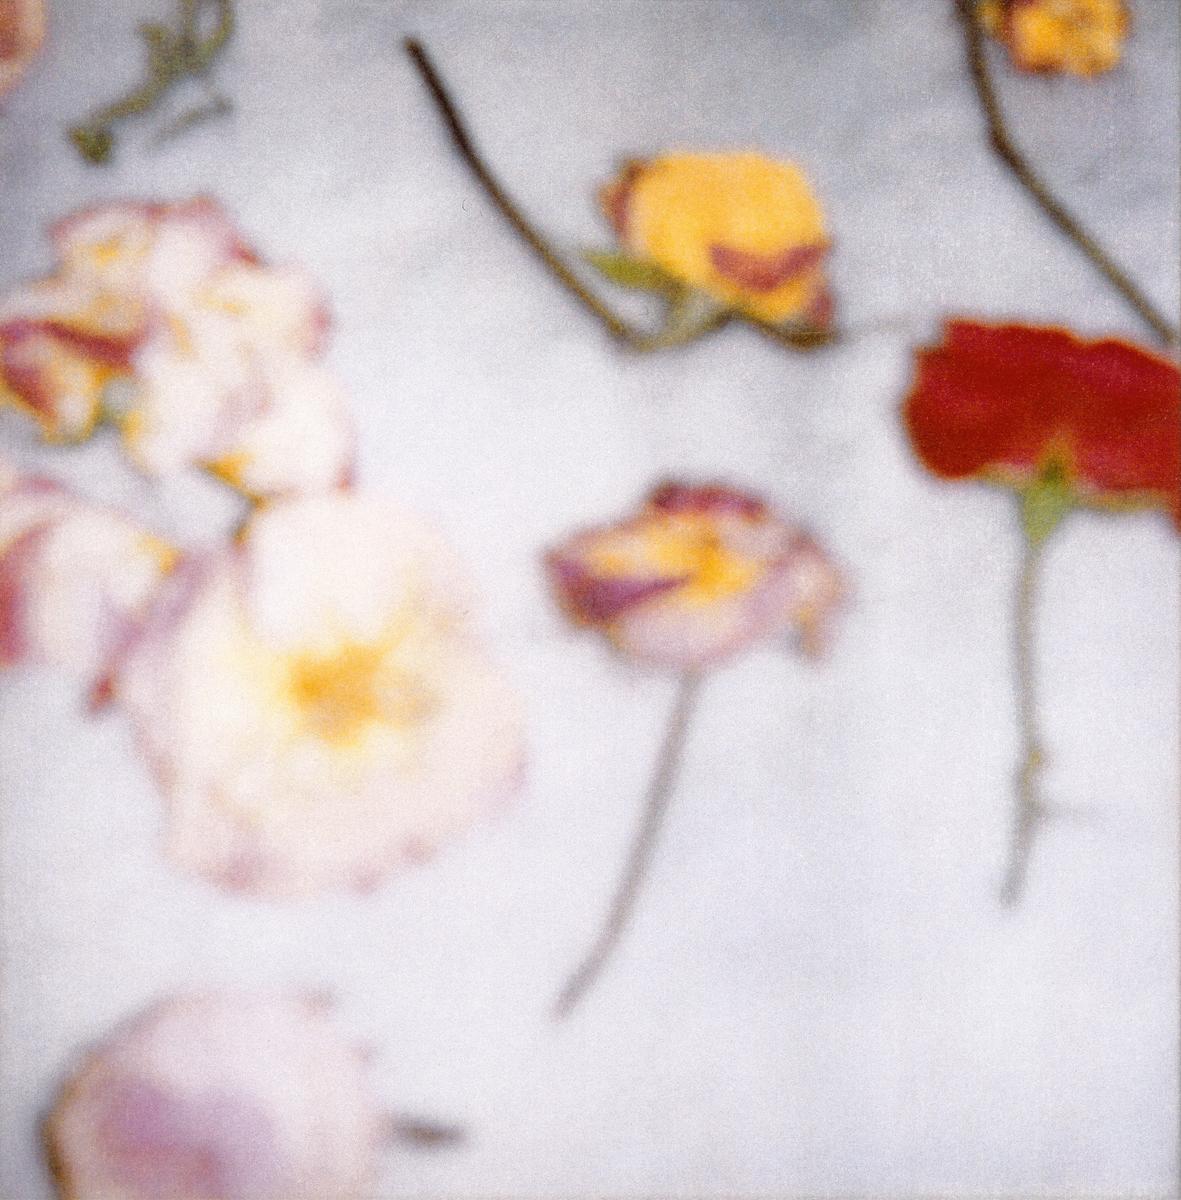 Cy Twombly, »Light Flowers (II)« Gaeta 2008 / © 2016 Fondazione Nicola Del Roscio